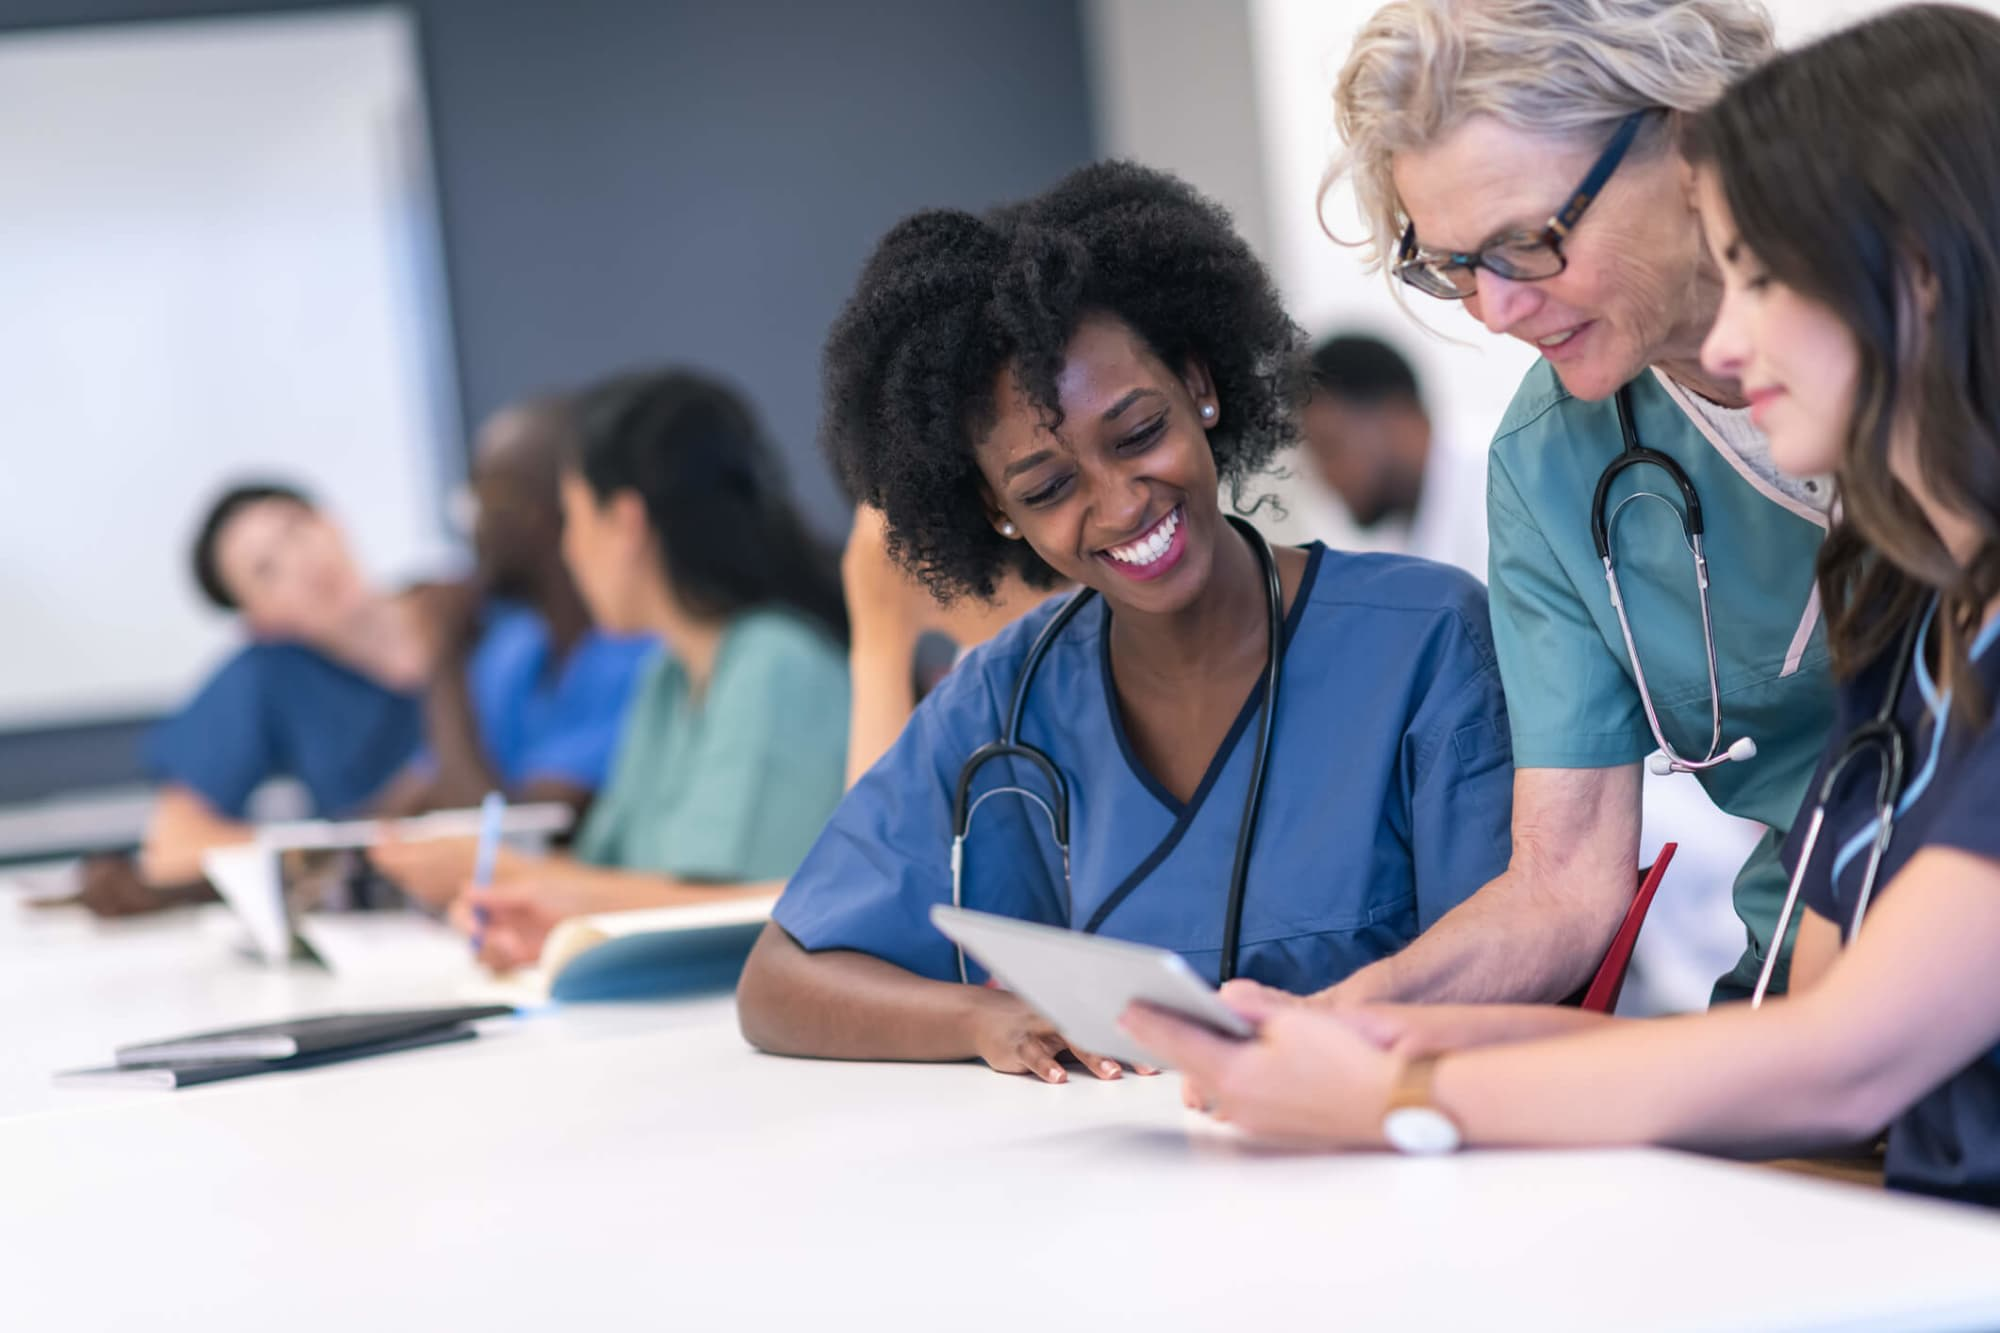 Top Nursing Schools and Programs Online 2021